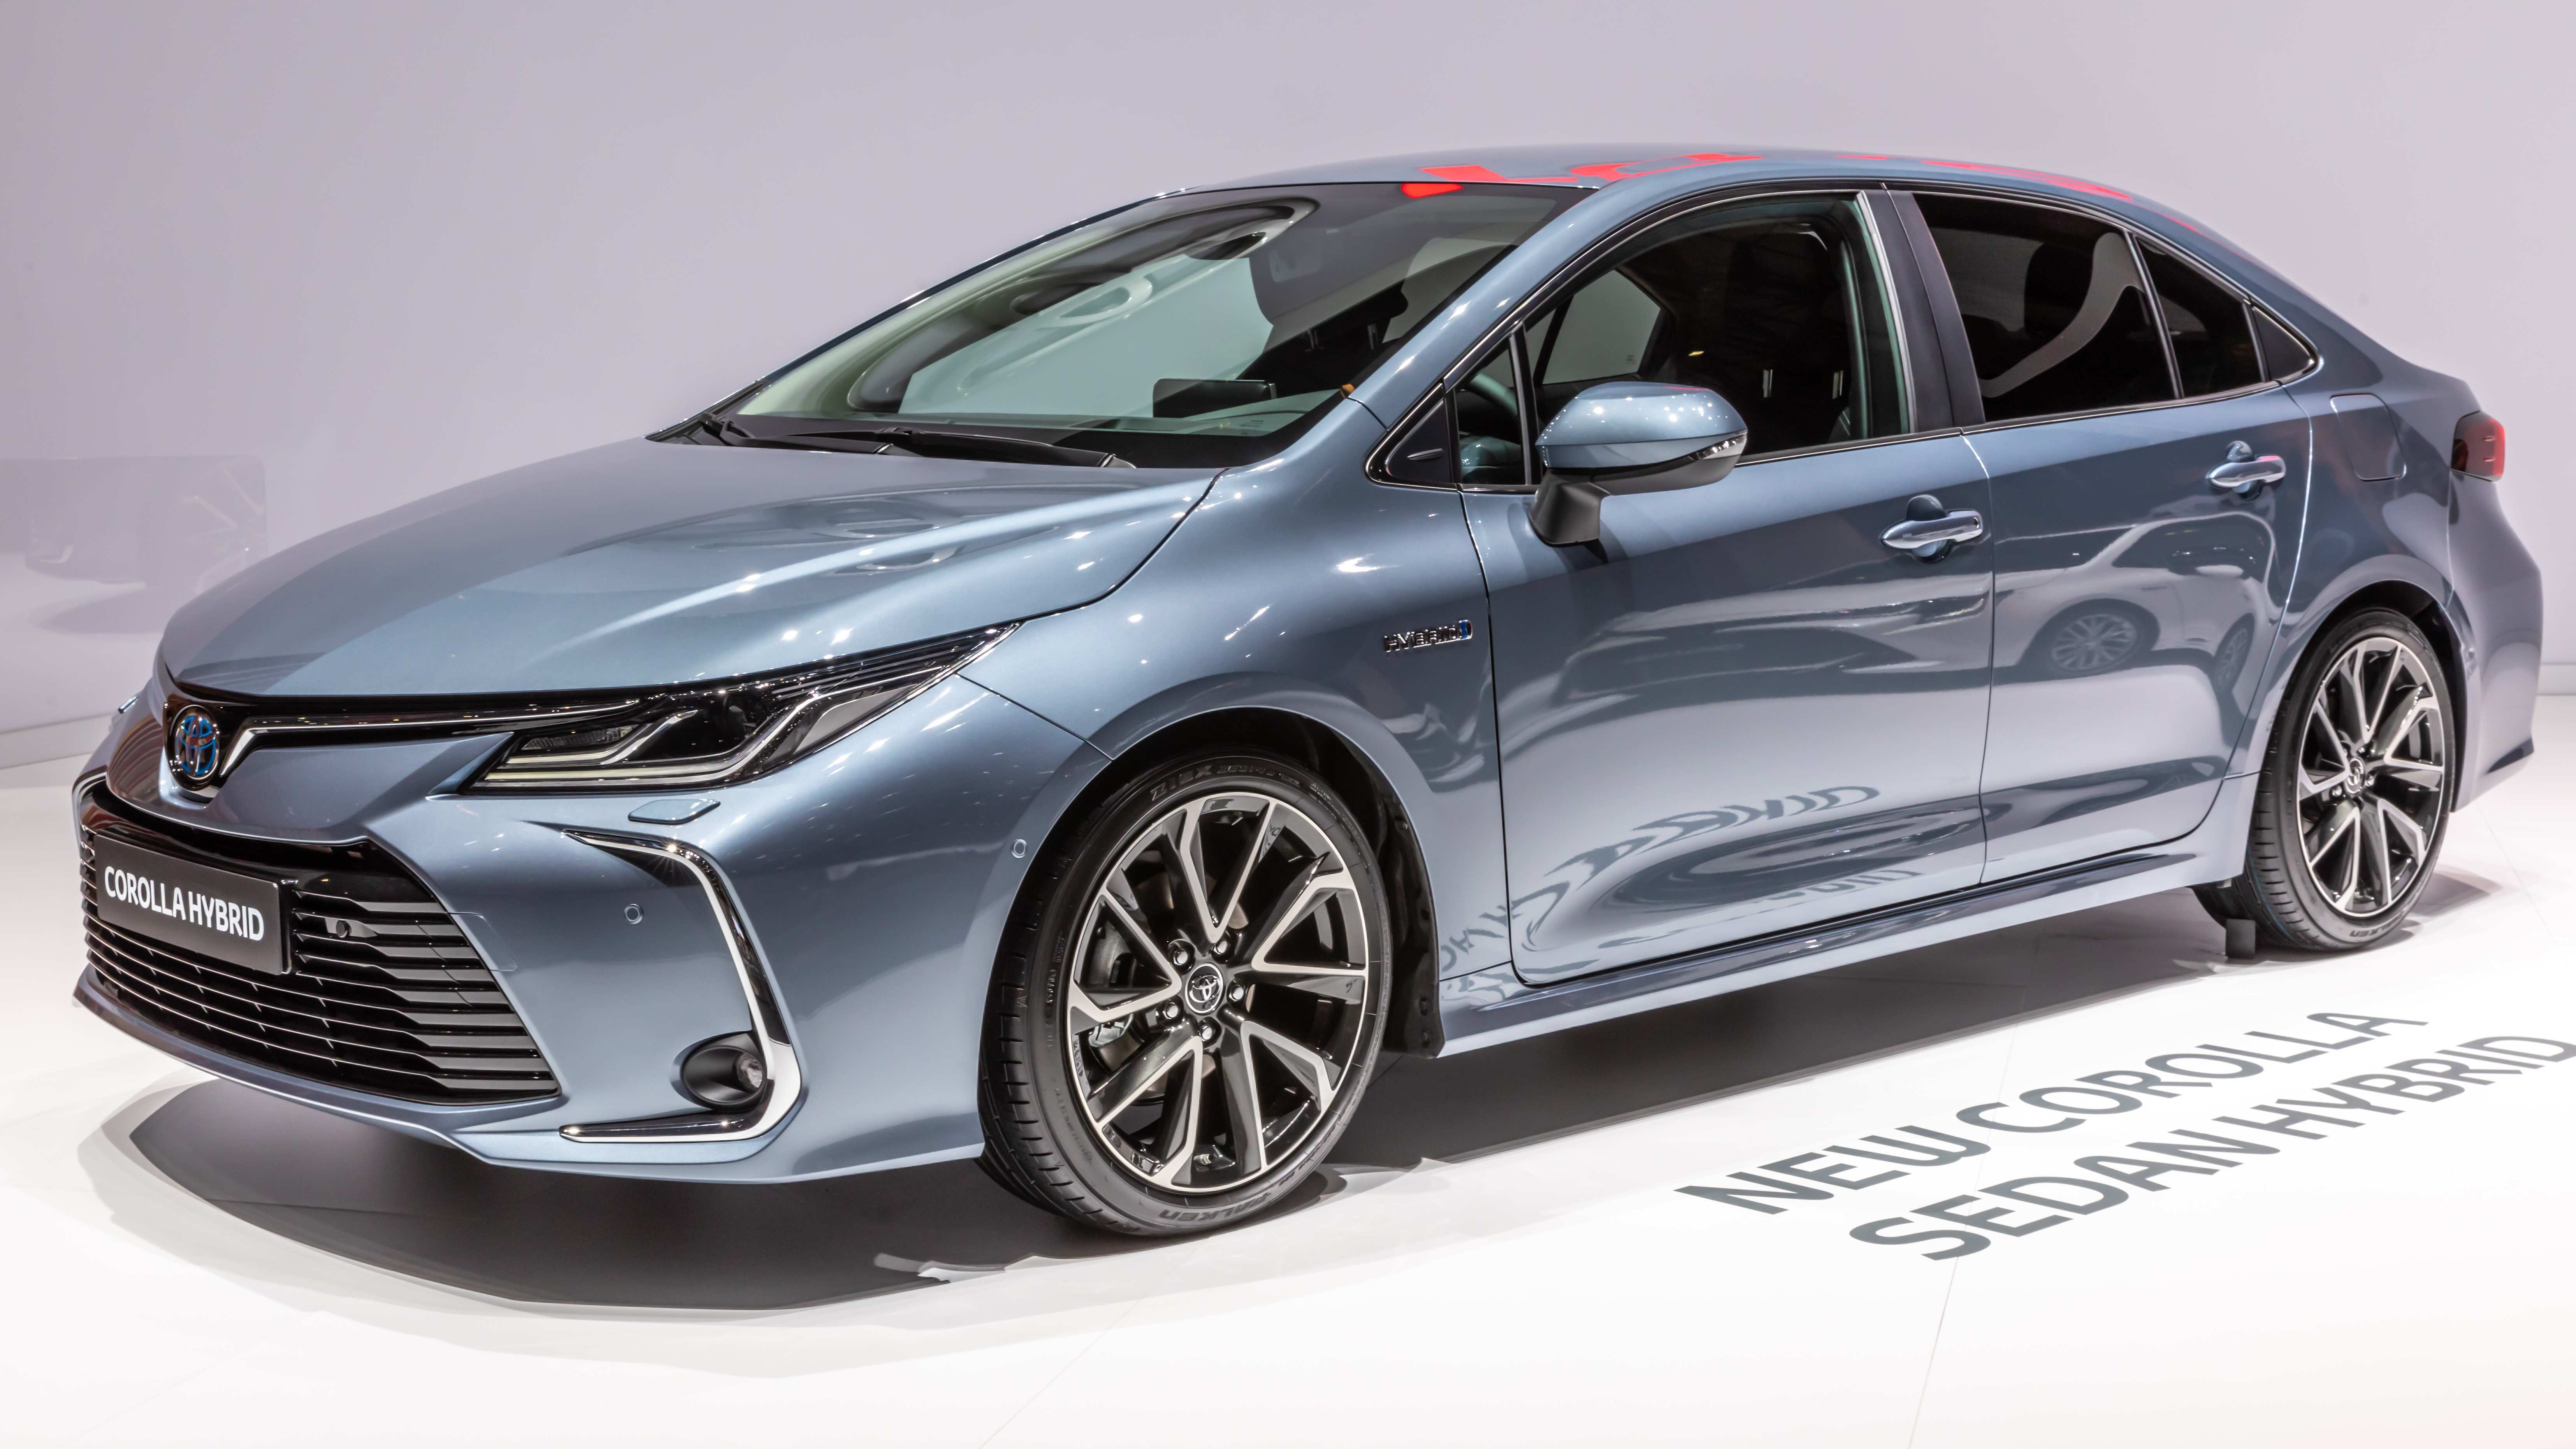 29 Gallery of Toyota Xli 2020 Model Reviews by Toyota Xli 2020 Model